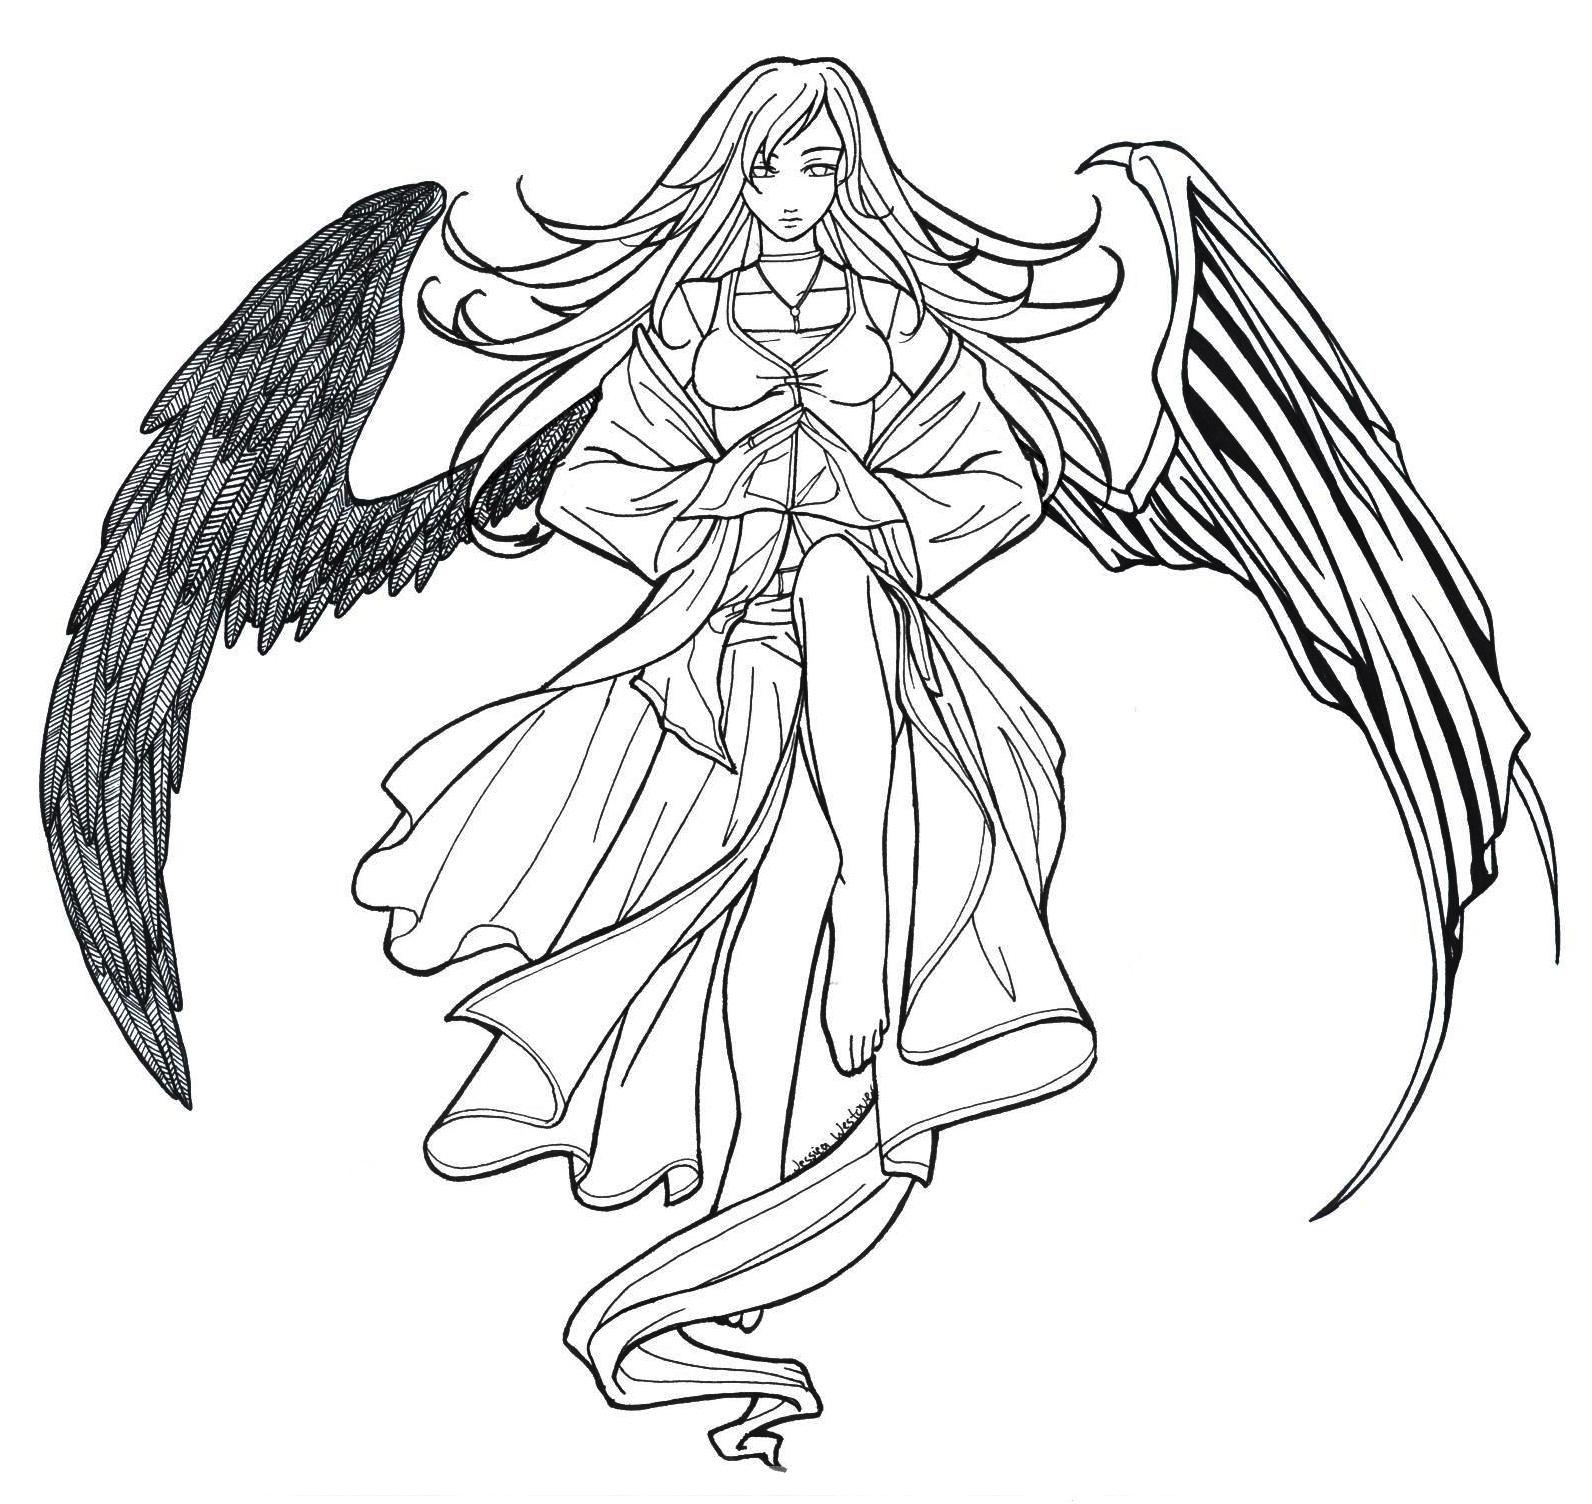 Line Drawing Angel : Fallen angel lineart by kuroihana on deviantart